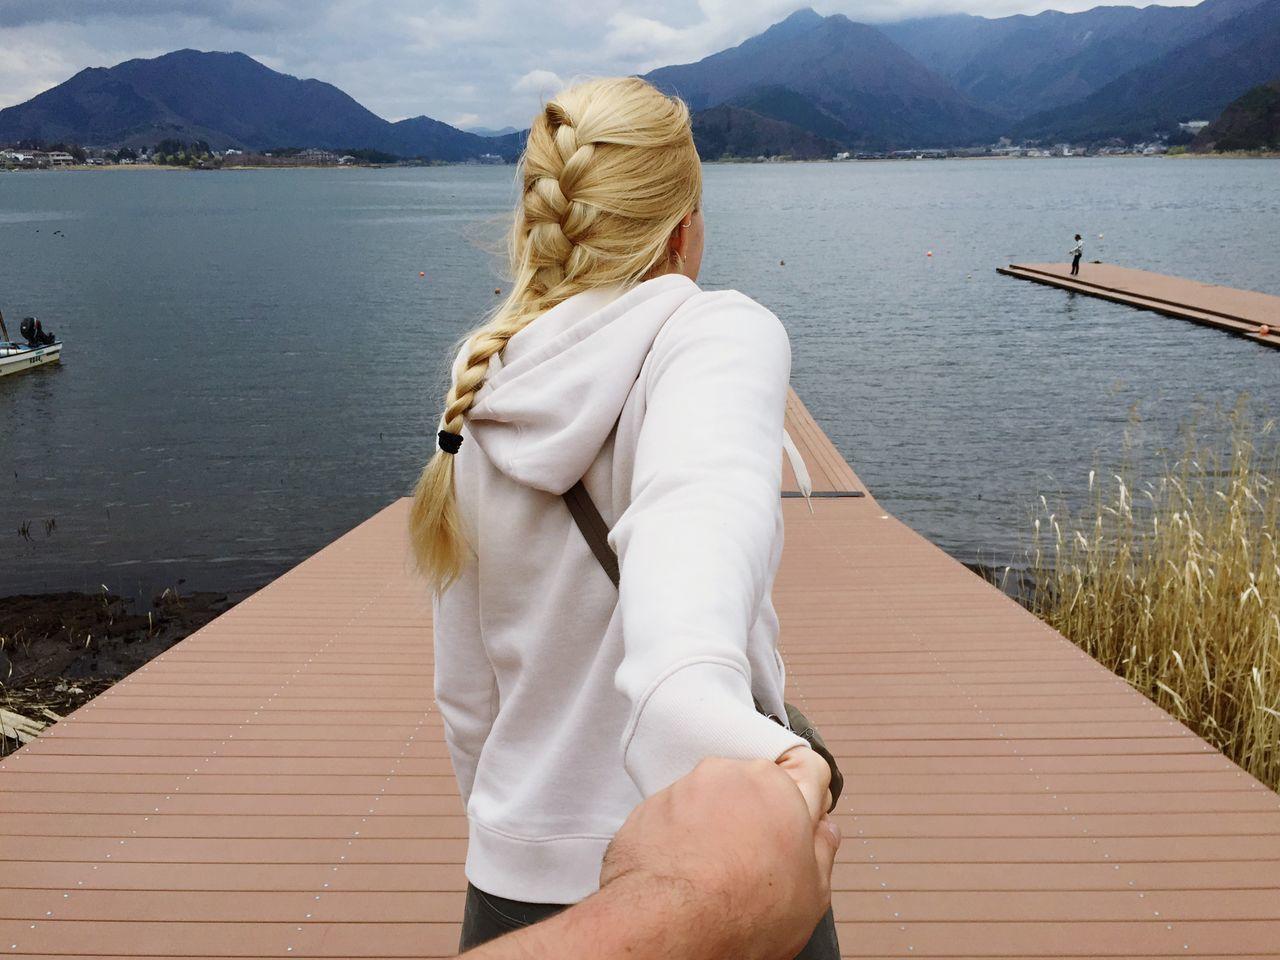 Beautiful stock photos of lake, Beauty In Nature, Blond Hair, Bonding, Braids